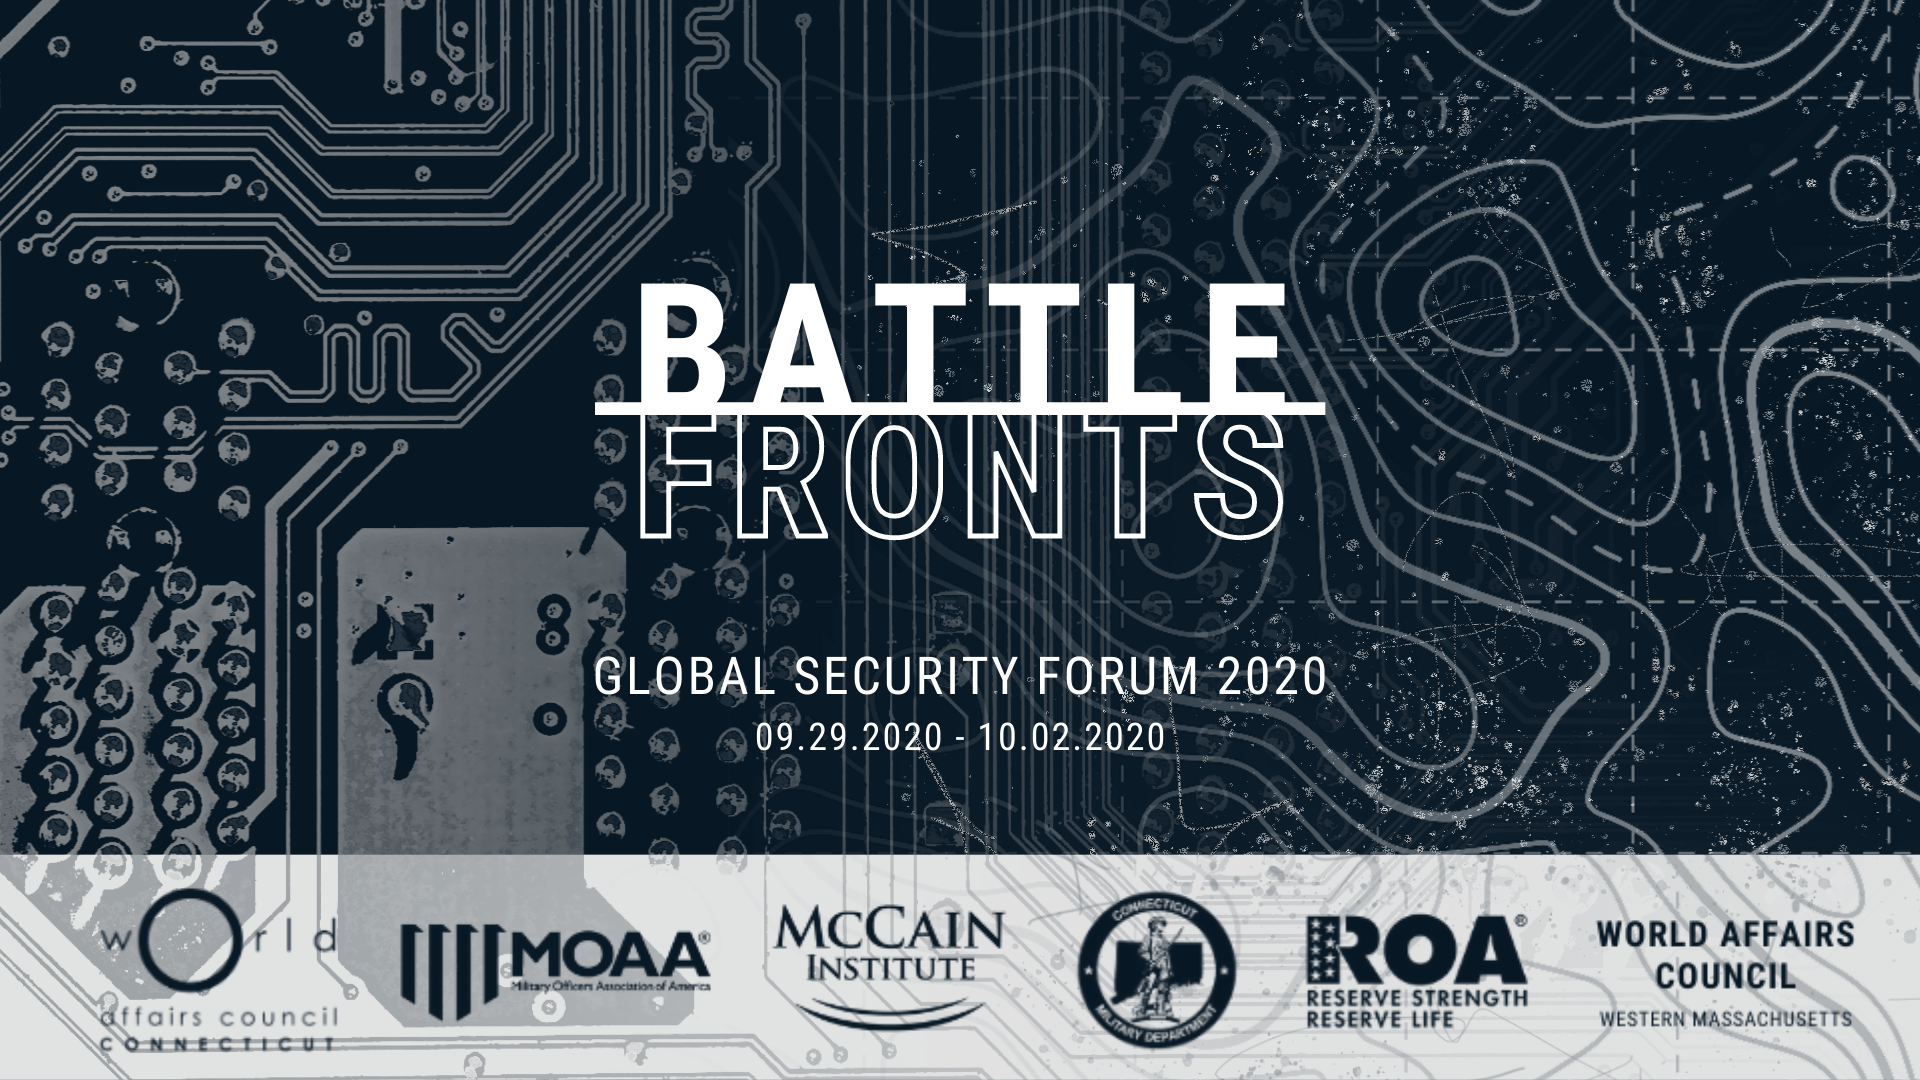 Global Security Forum 2020 Battlefronts